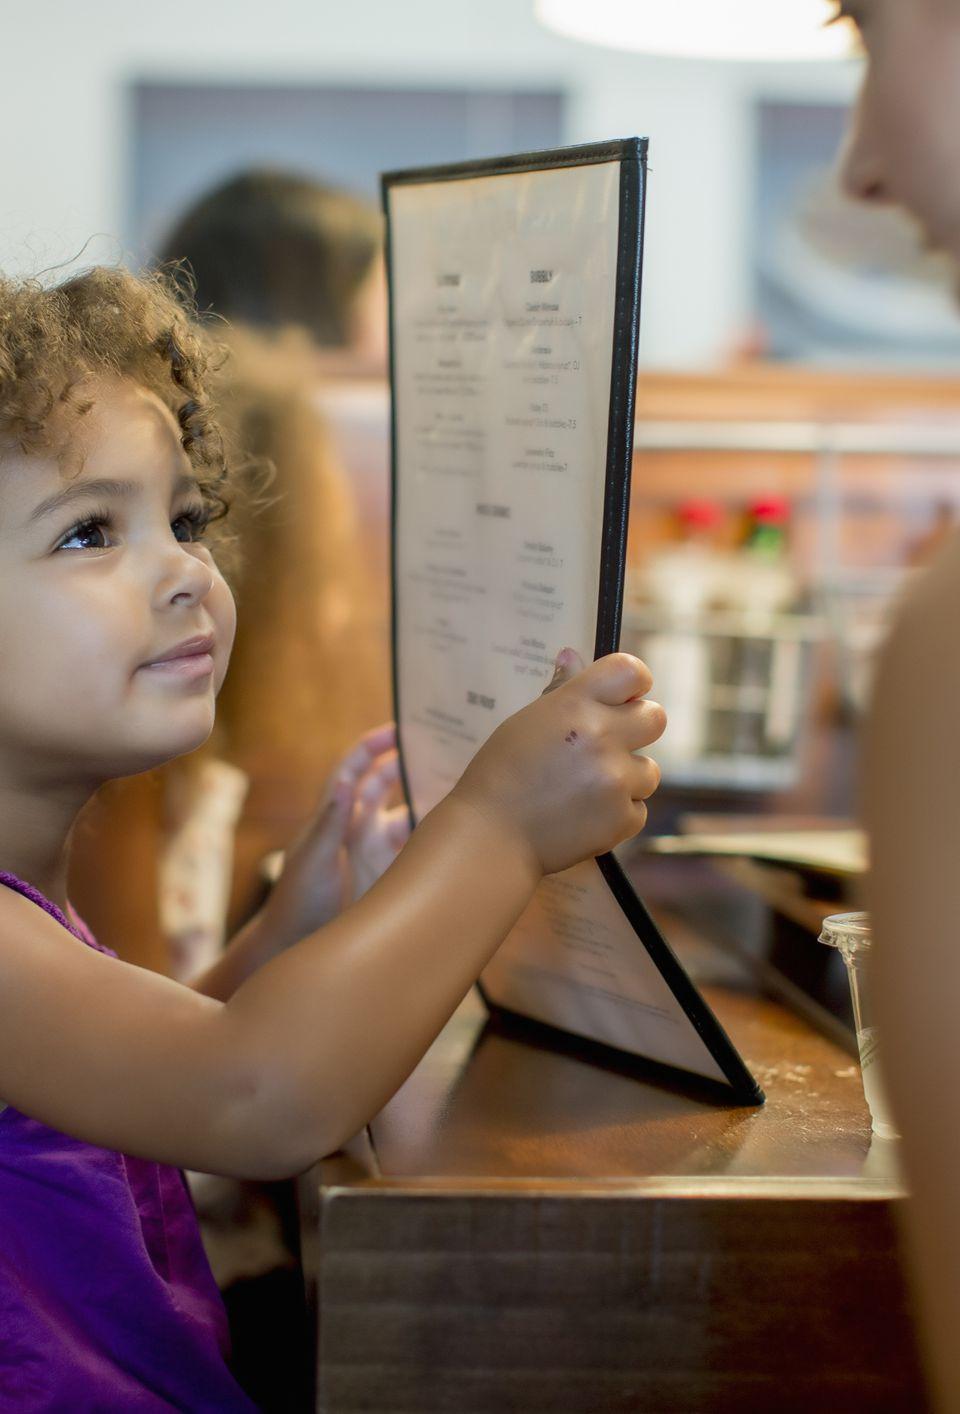 kid looking at restaurant menu